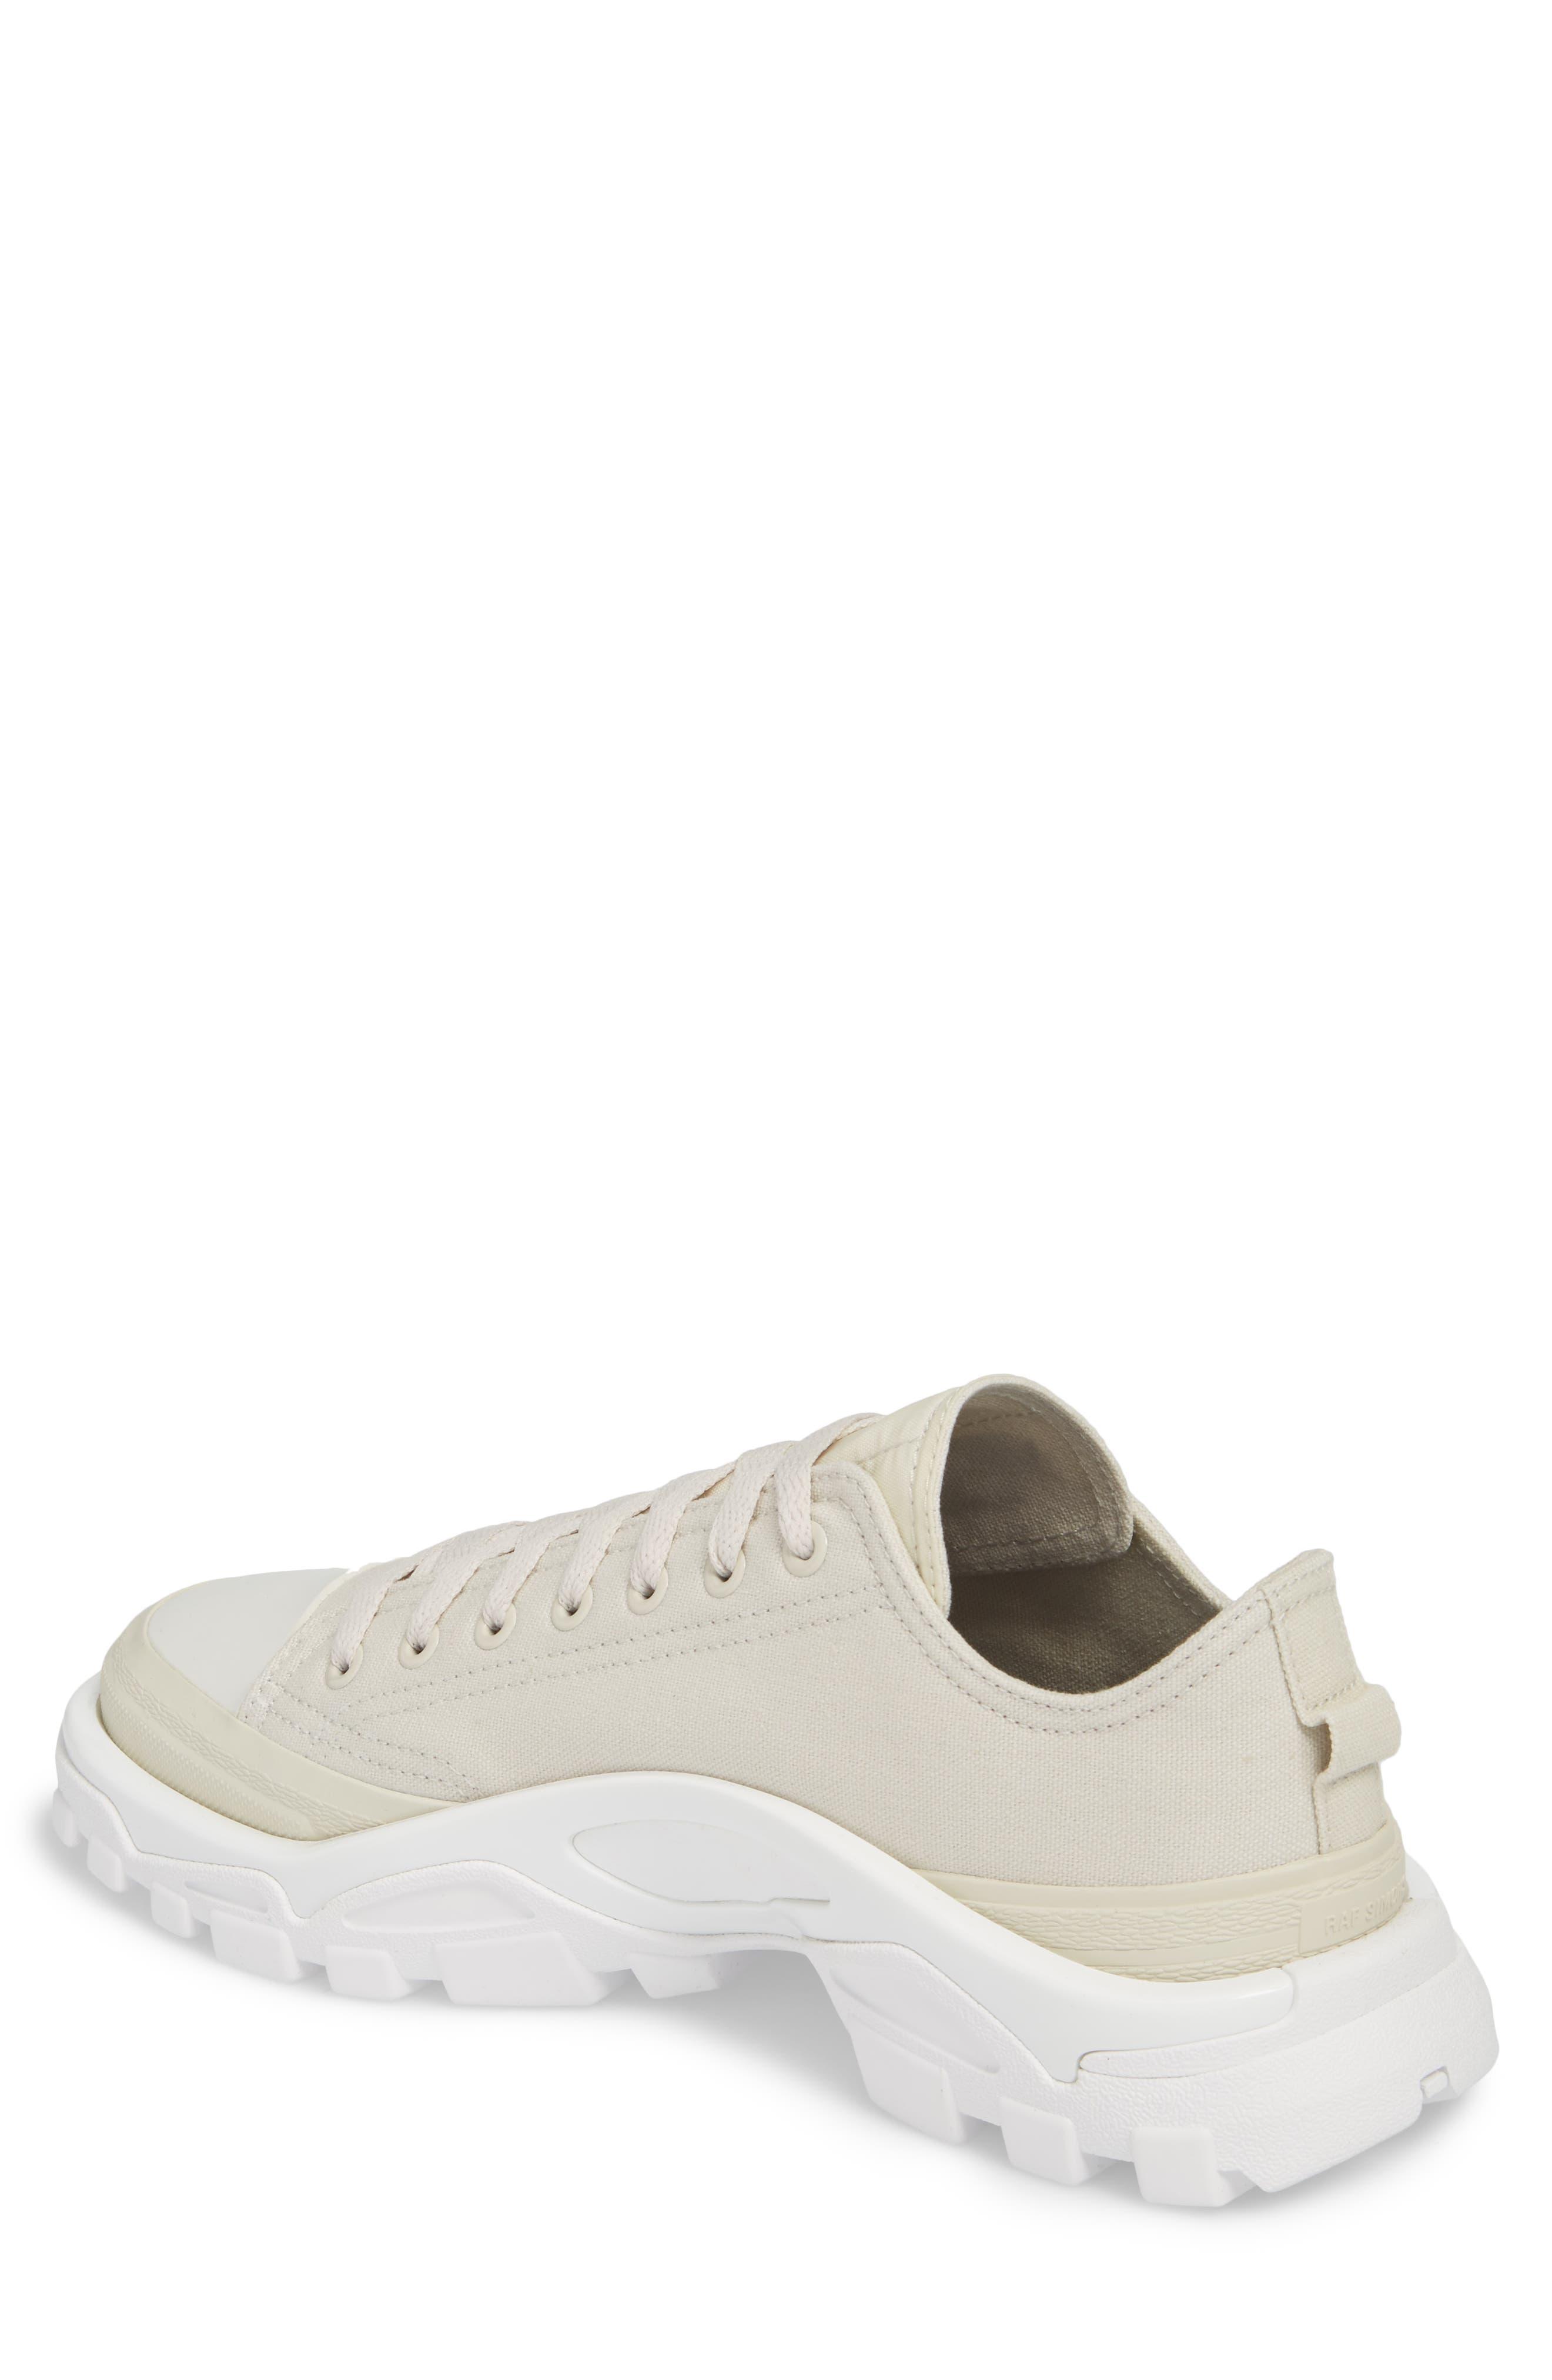 Detroit Low Top Sneaker,                             Alternate thumbnail 2, color,                             Beige/ White